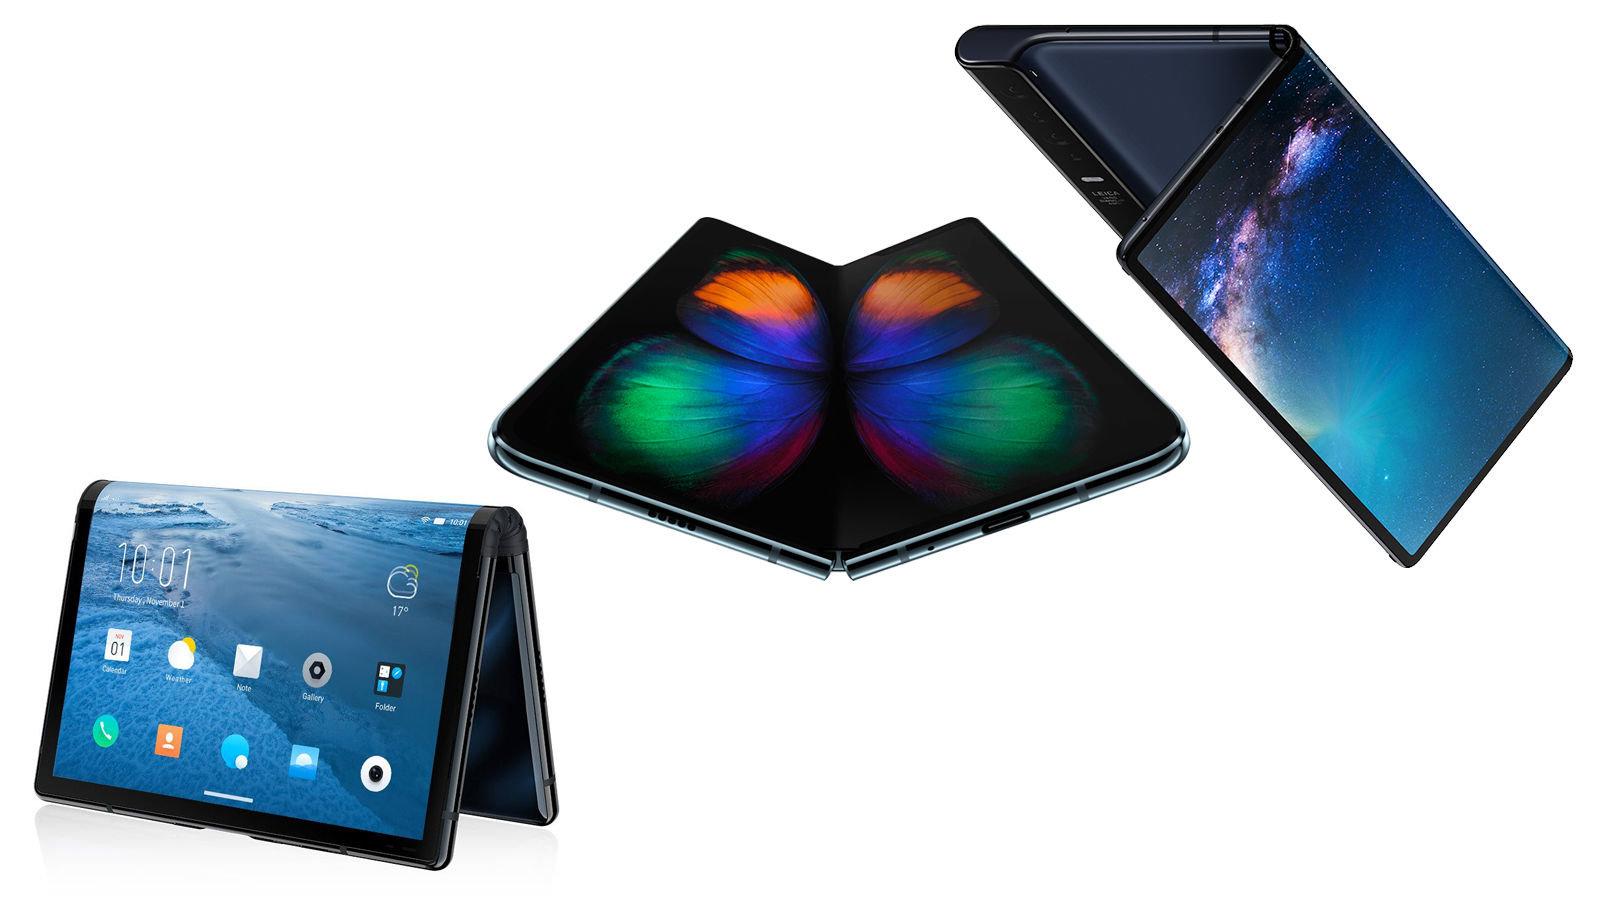 Smartphones pliants Royole Flexpai, Galaxy Fold et Huawei Mate X